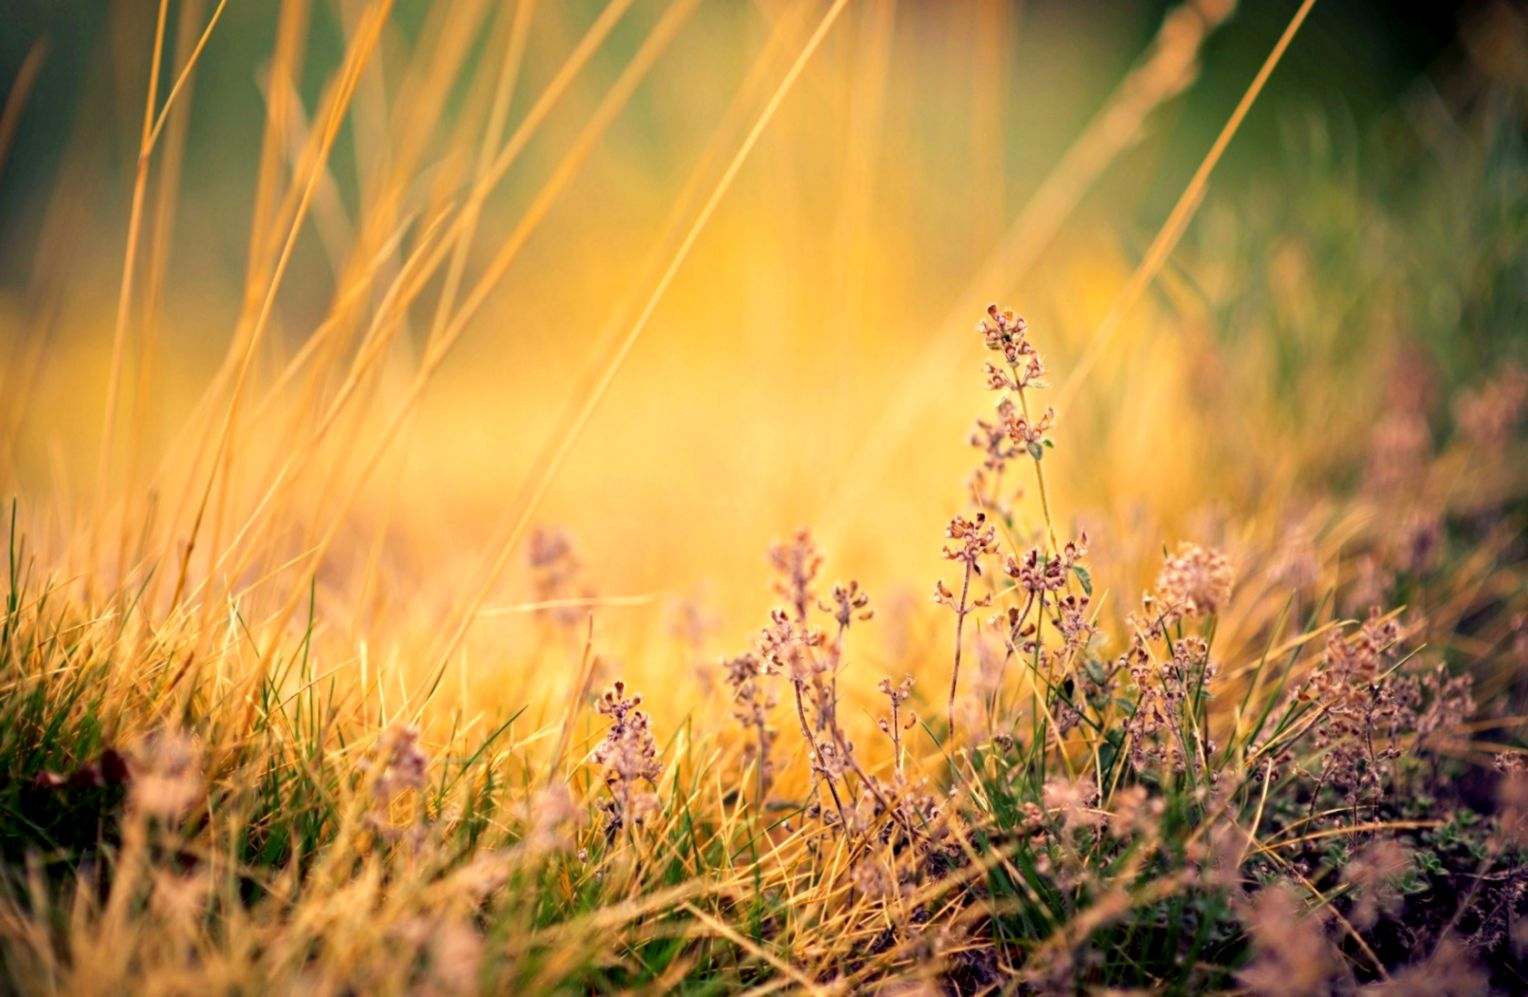 Nature Morning Grass Plants Flowers Hd Wallpaper Wallpapers